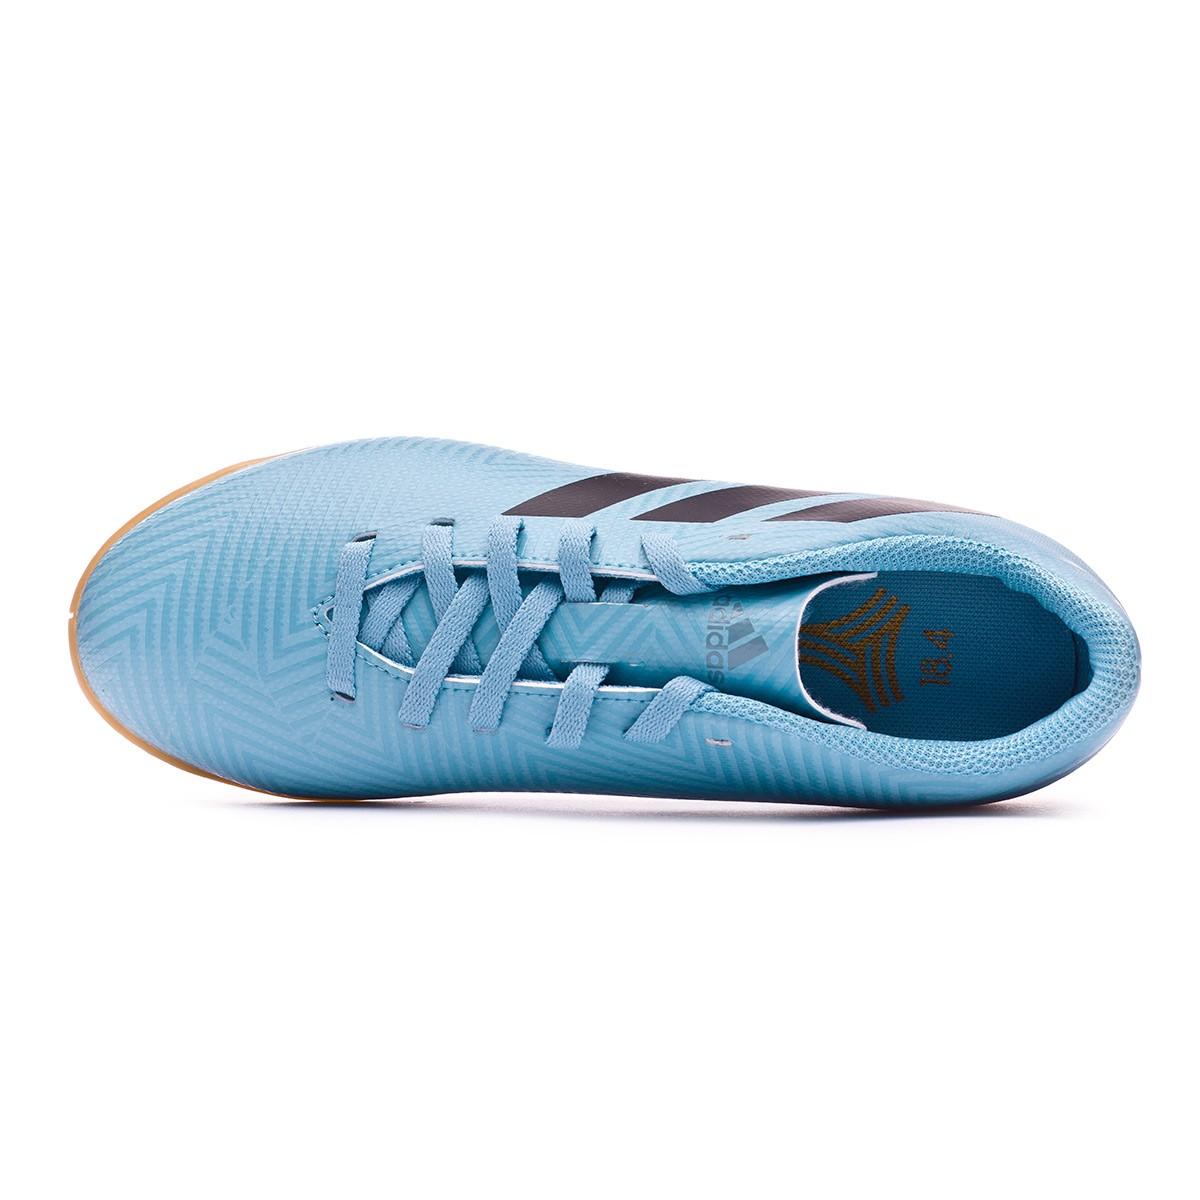 c441327569683 Futsal Boot adidas Kids Nemeziz Messi Tango 18.4 IN Ash blue-Core black-Raw  grey - Football store Fútbol Emotion